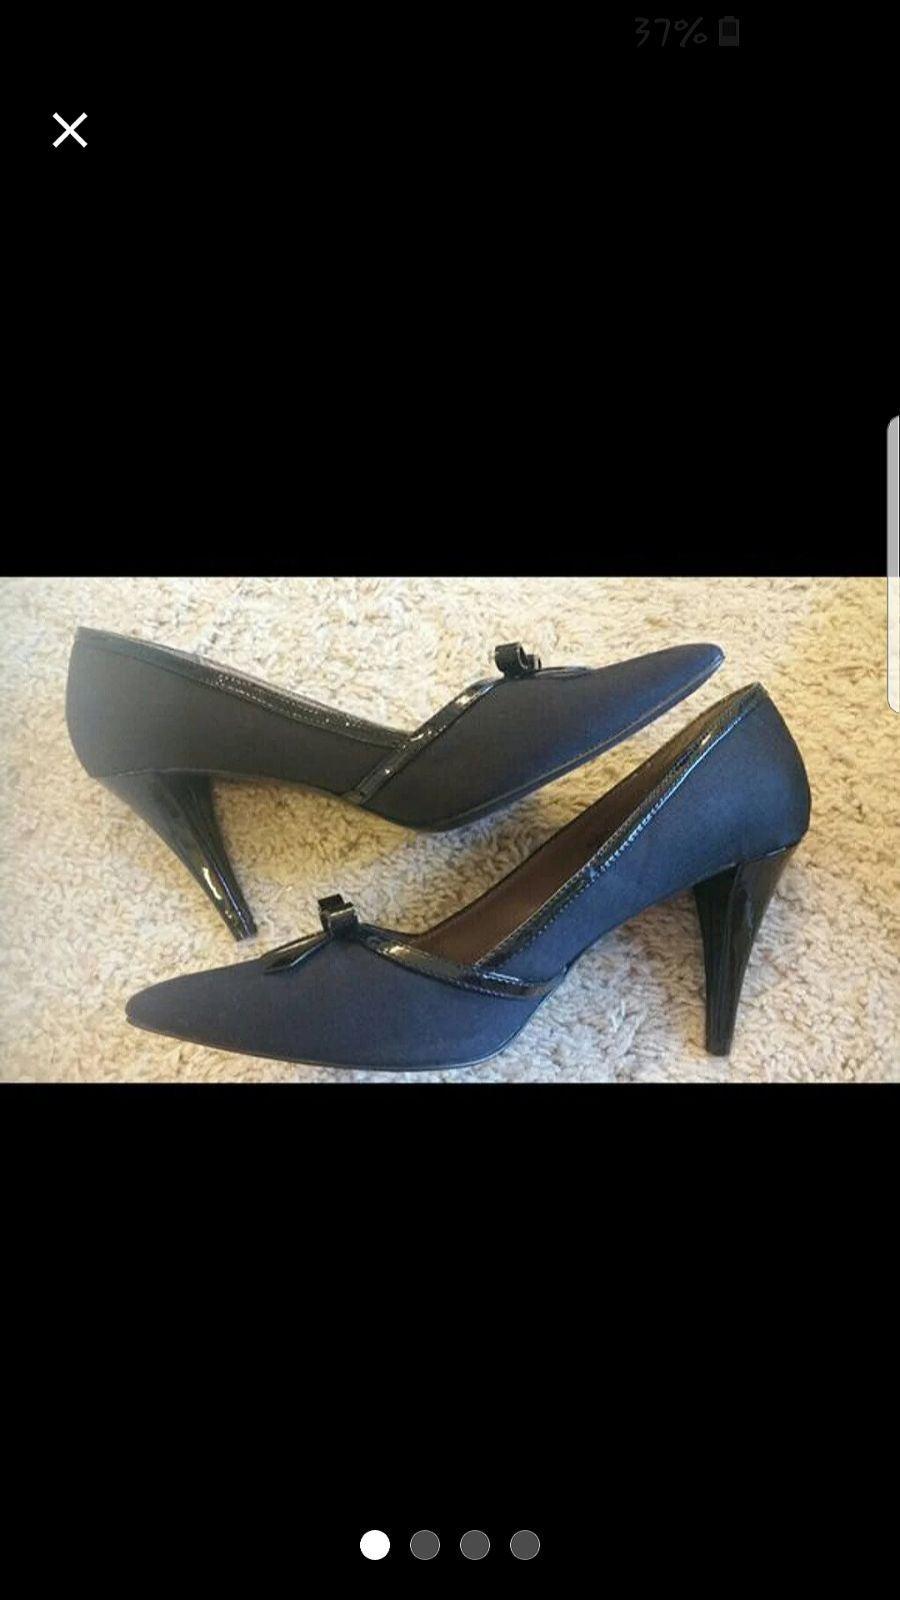 Tahari heels, size 9